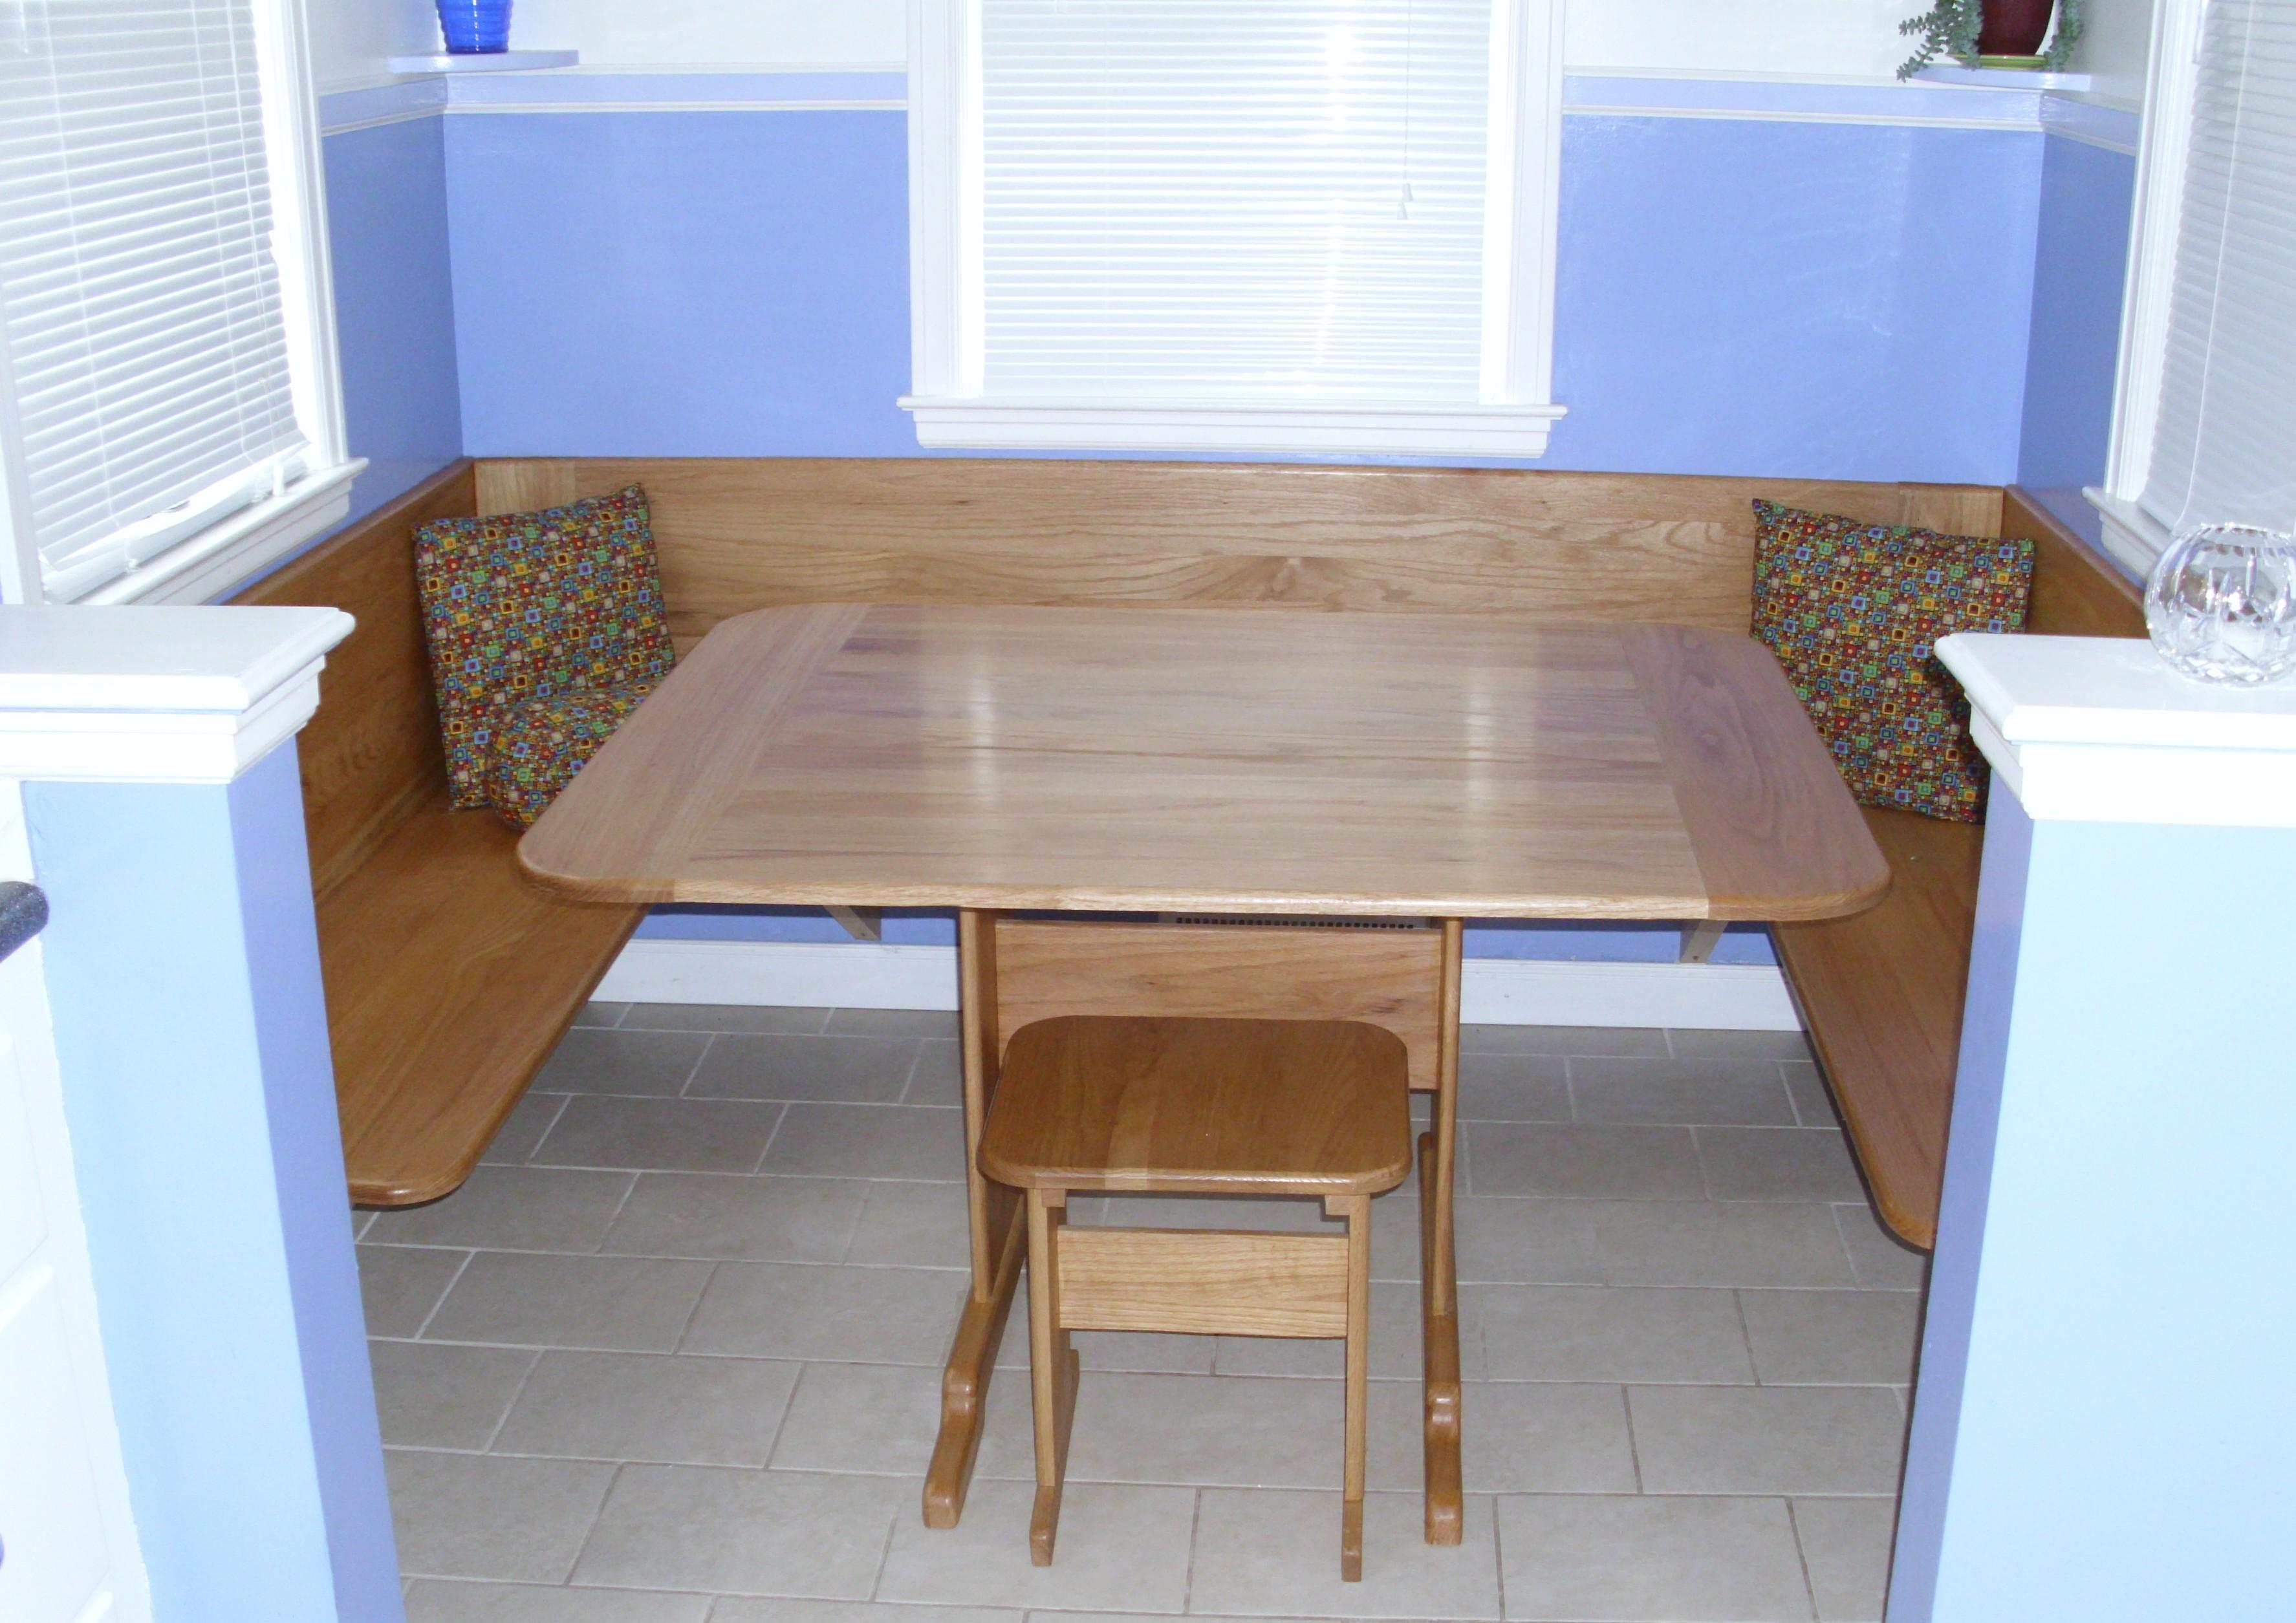 Design Built In Breakfast Nook dallas bayles handyman craftsman 319 350 9427 built in breakfast nook